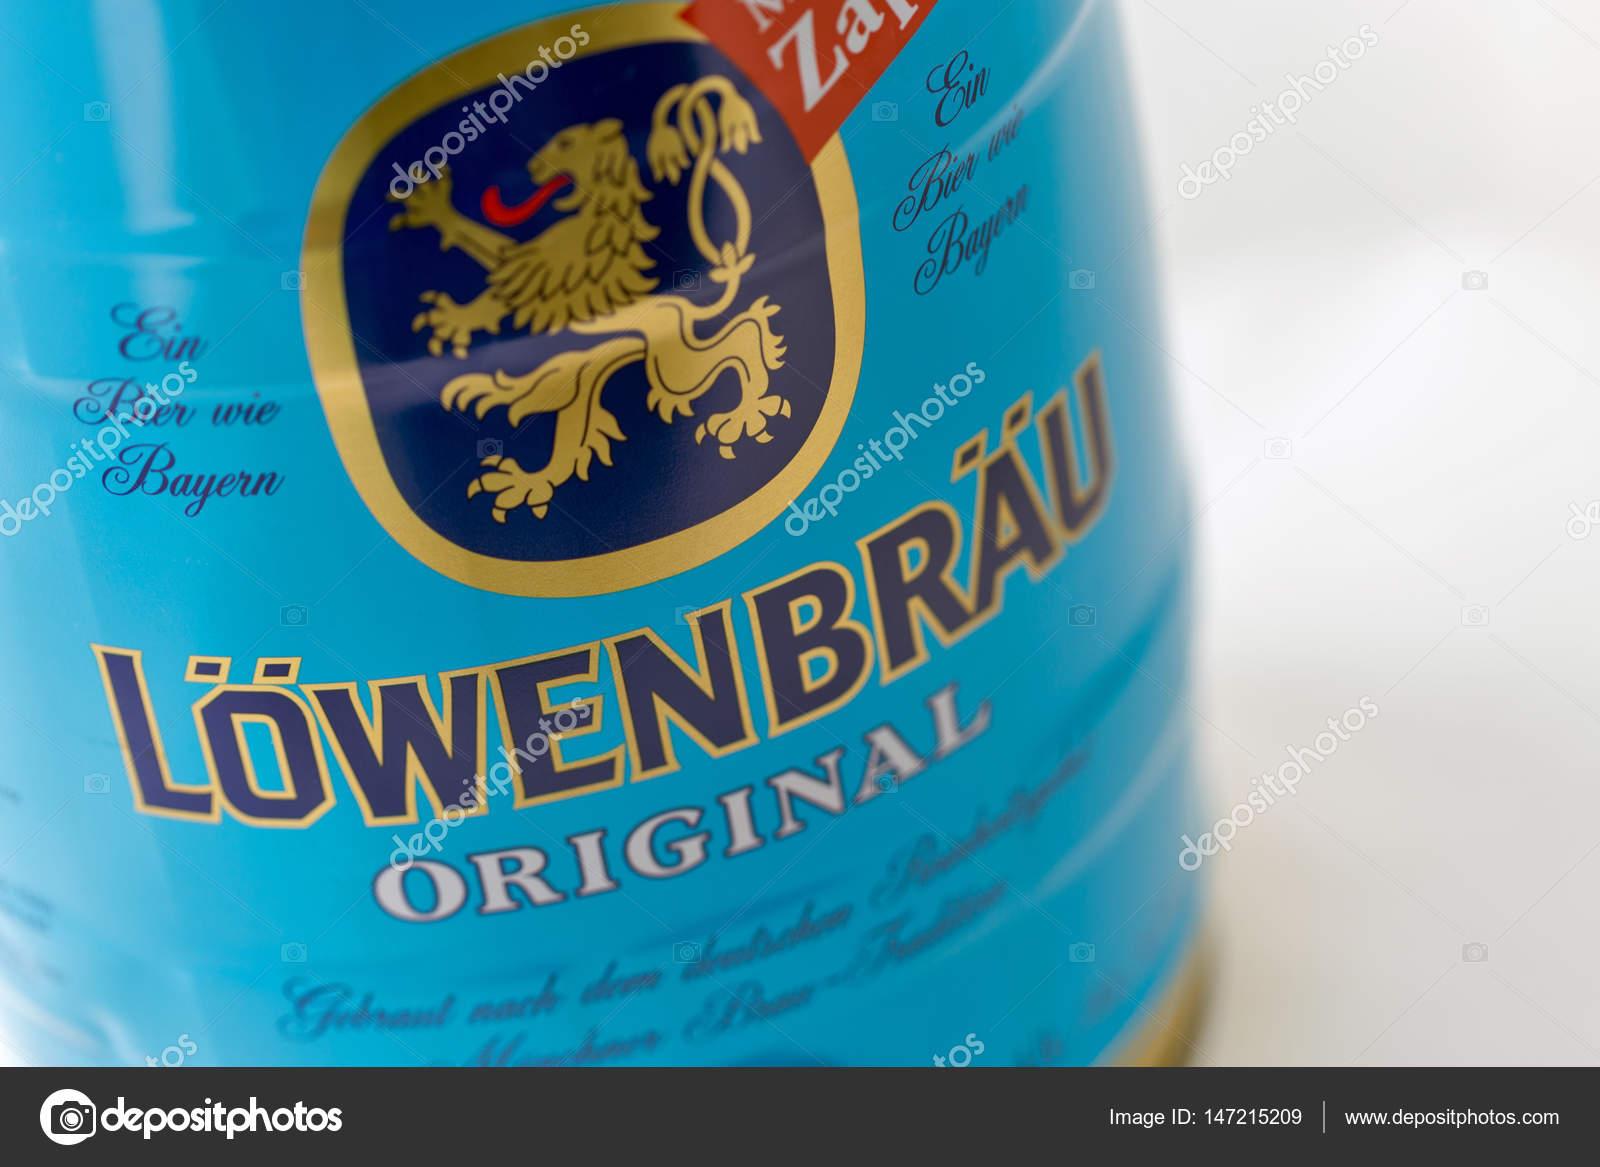 depositphotos_147215209-stock-photo-lowenbrau-small-barrel-of-beer.jpg